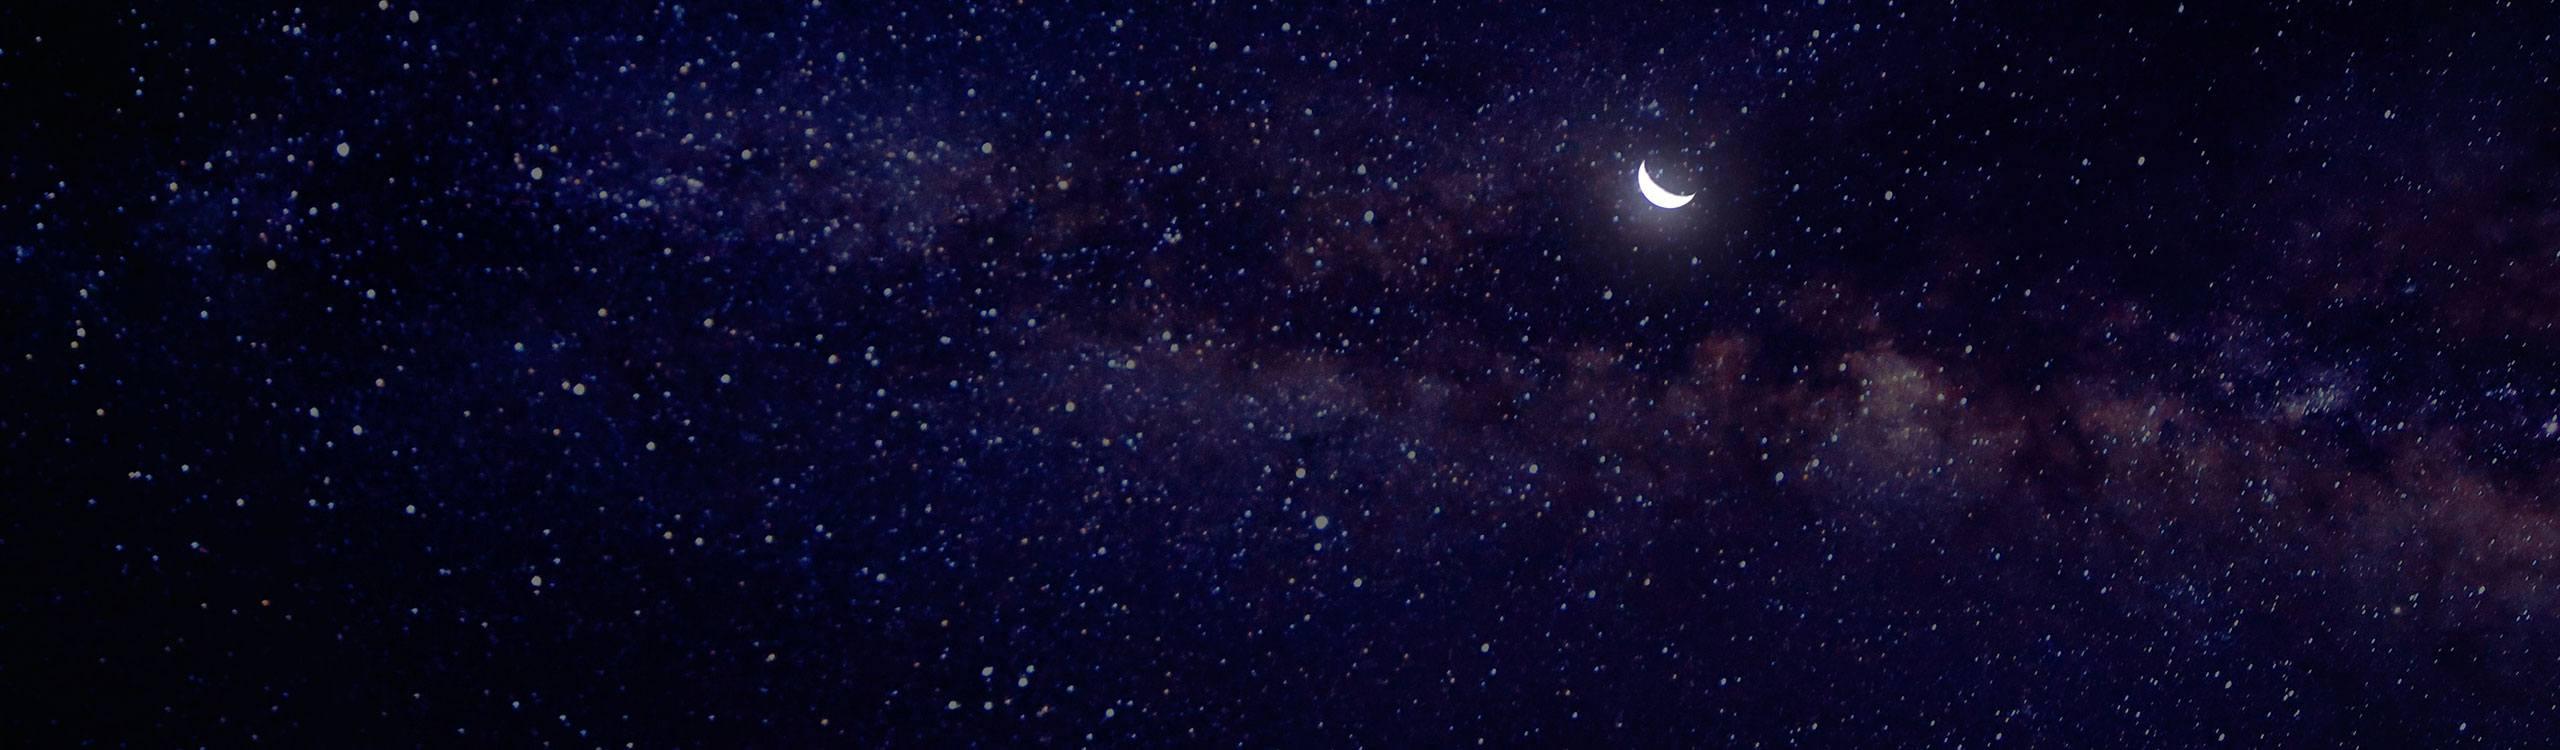 LayerSlider Stars Background